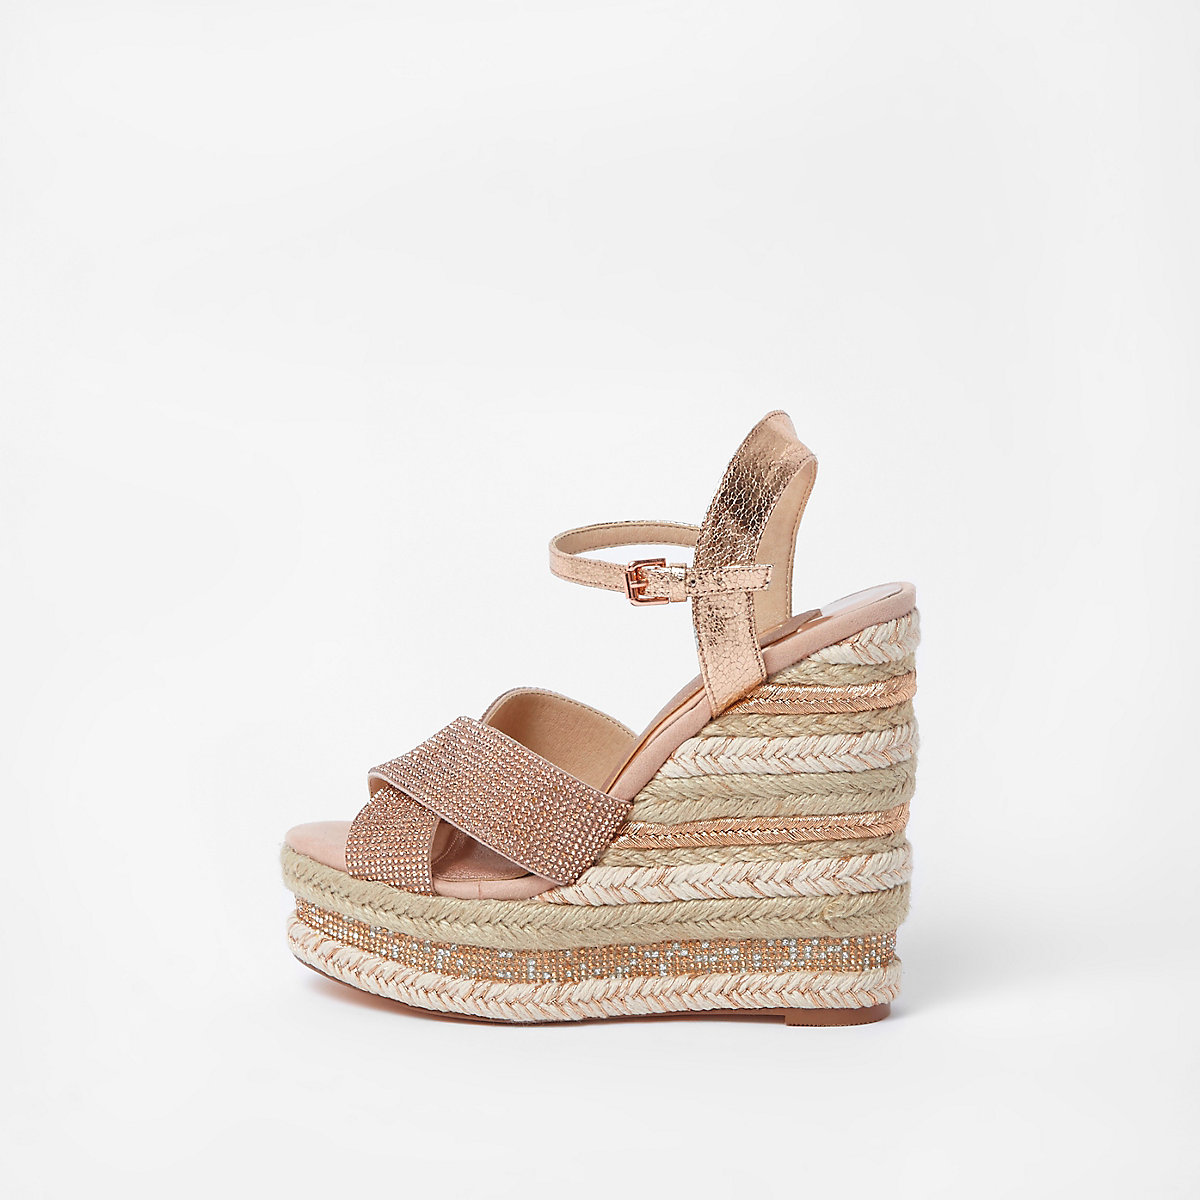 Light pink metallic rhinestone wedge sandals